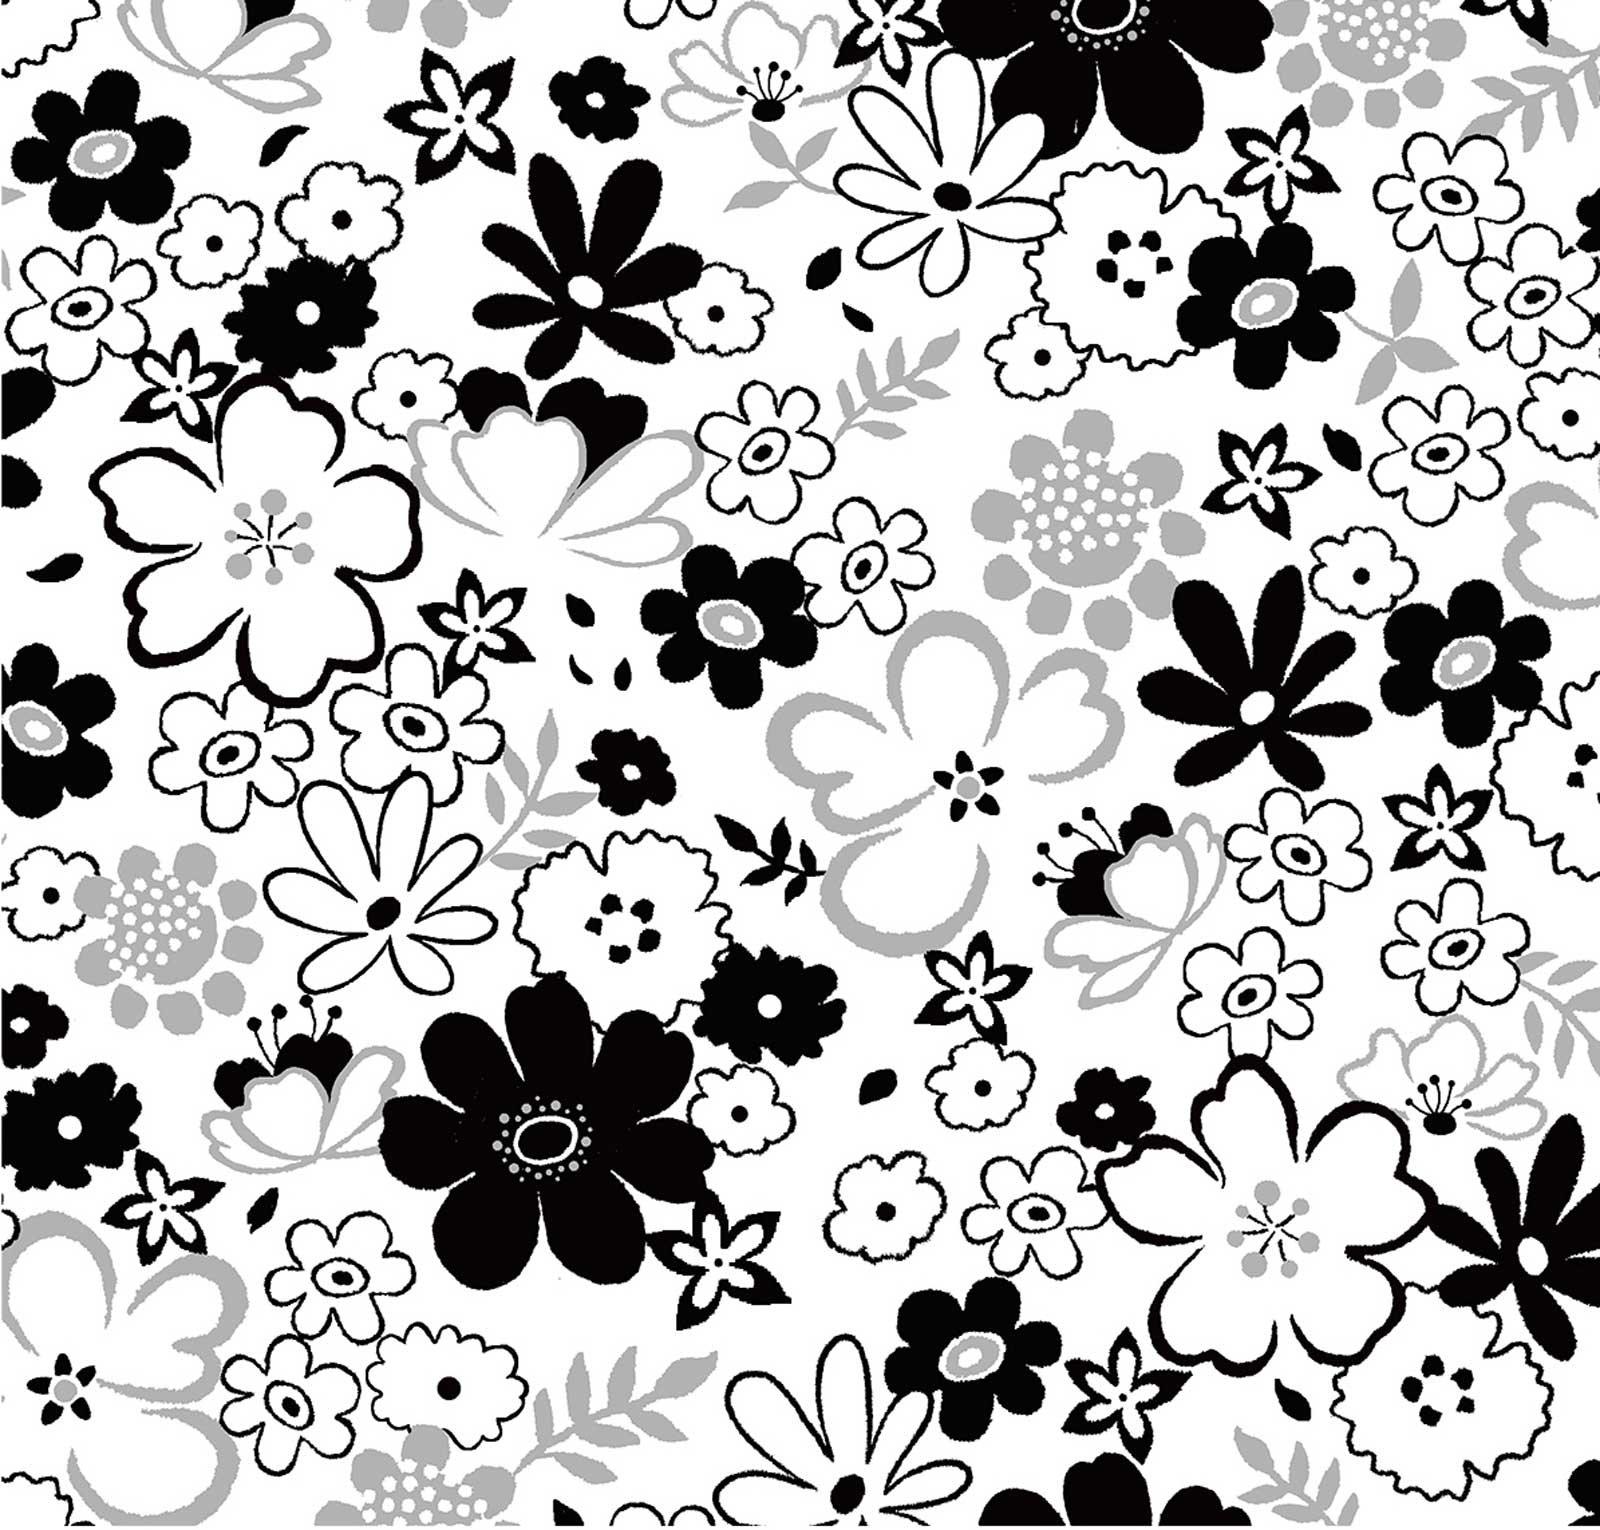 Black Tie - Floral